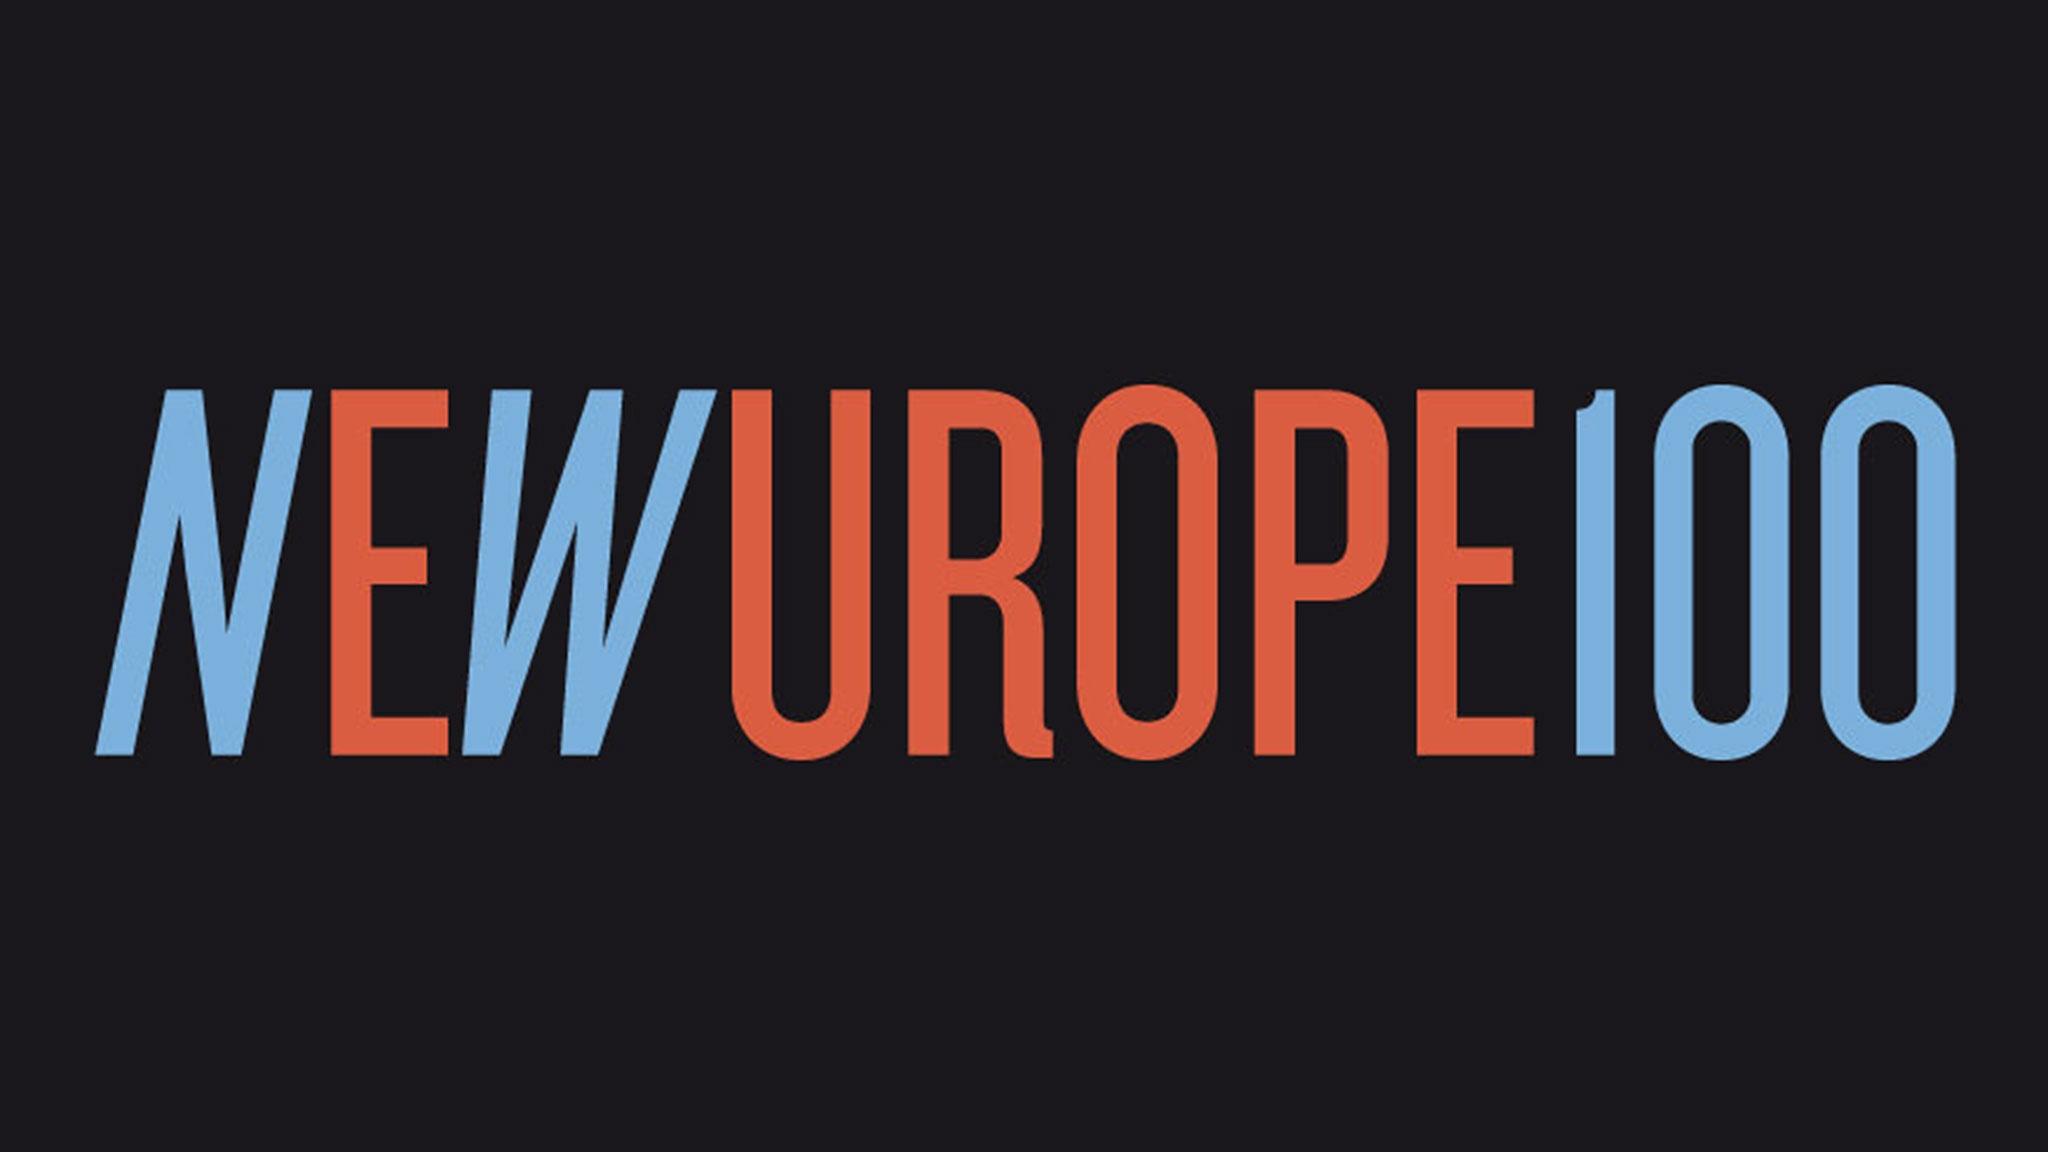 new europe 100.jpeg